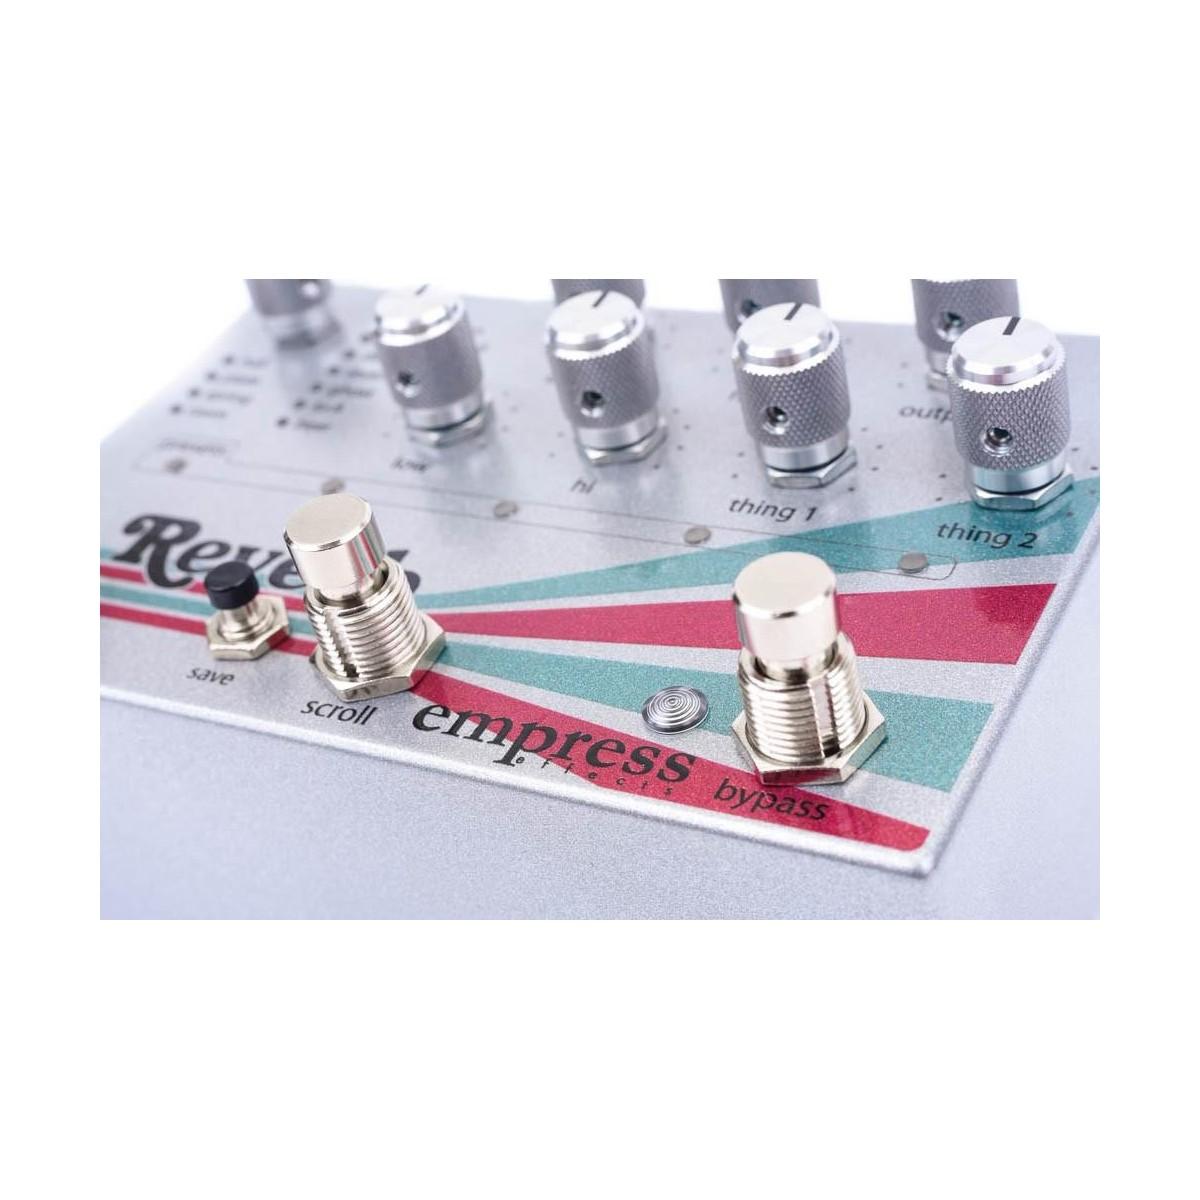 ERNIE BALL 2850 SUPER LONG SCALE SLINKY BASS 5 .045/.130